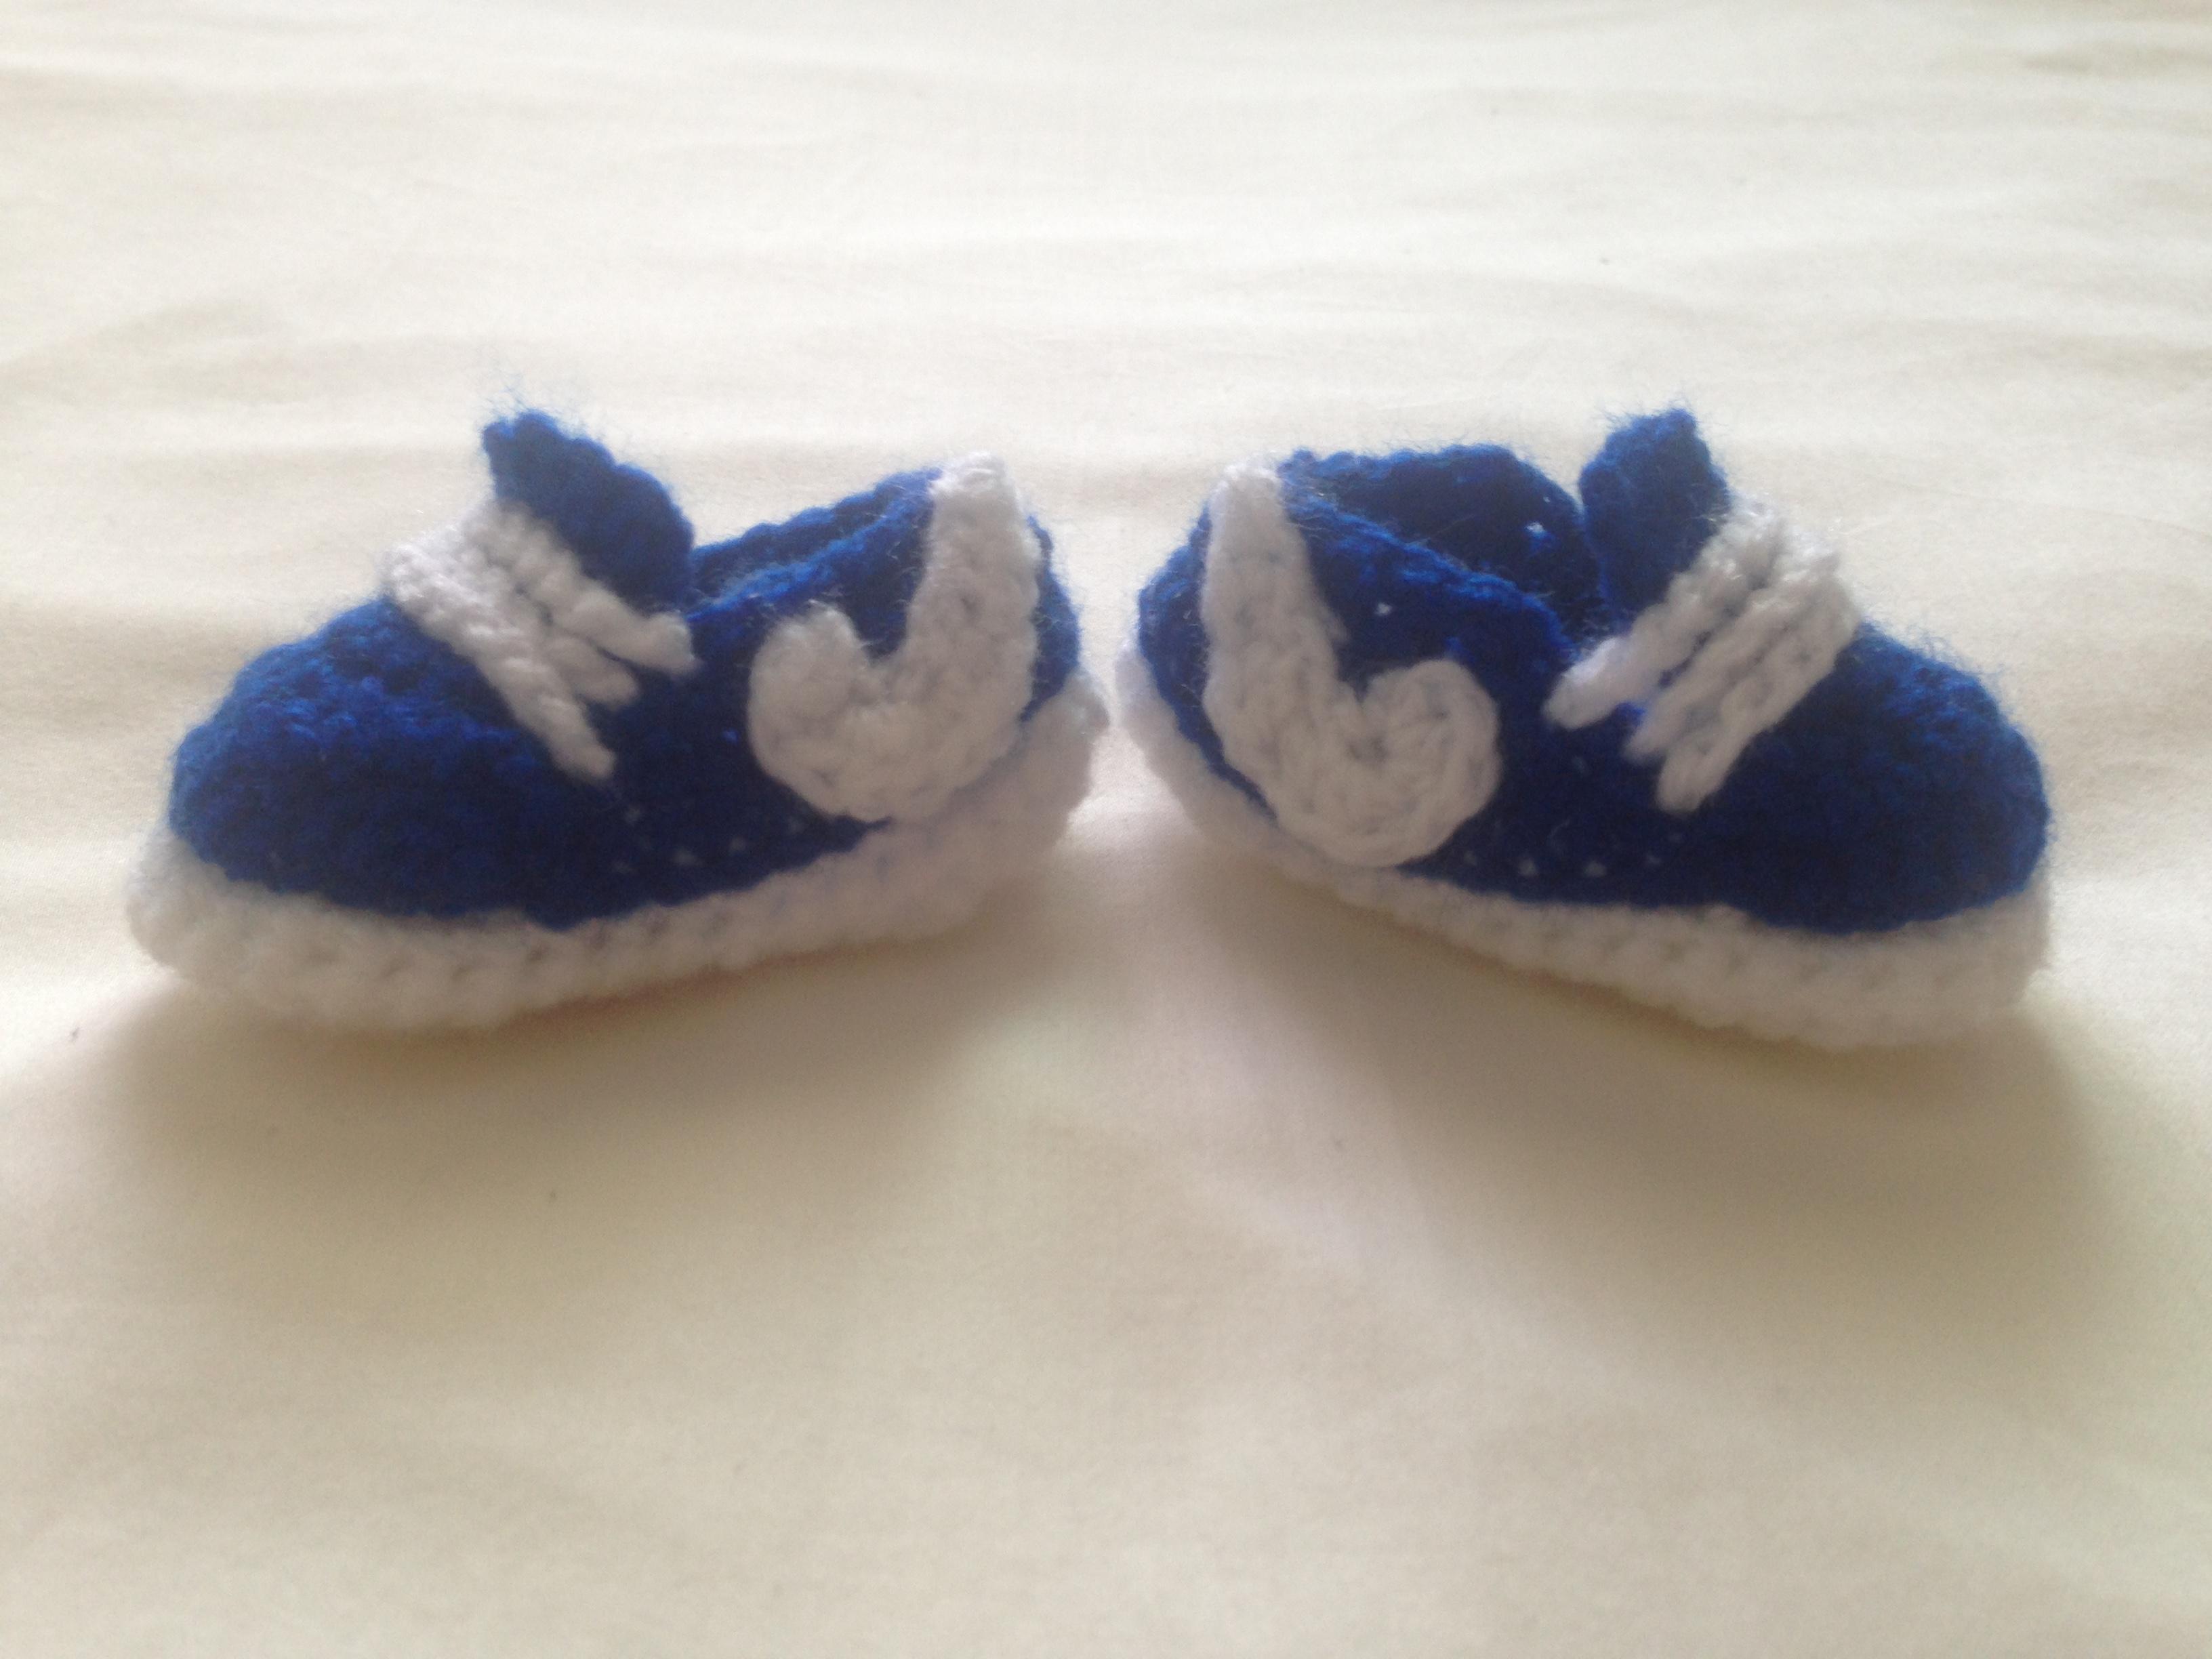 64cdaa458 Sapatinho tênis Nike para bebê no Elo7